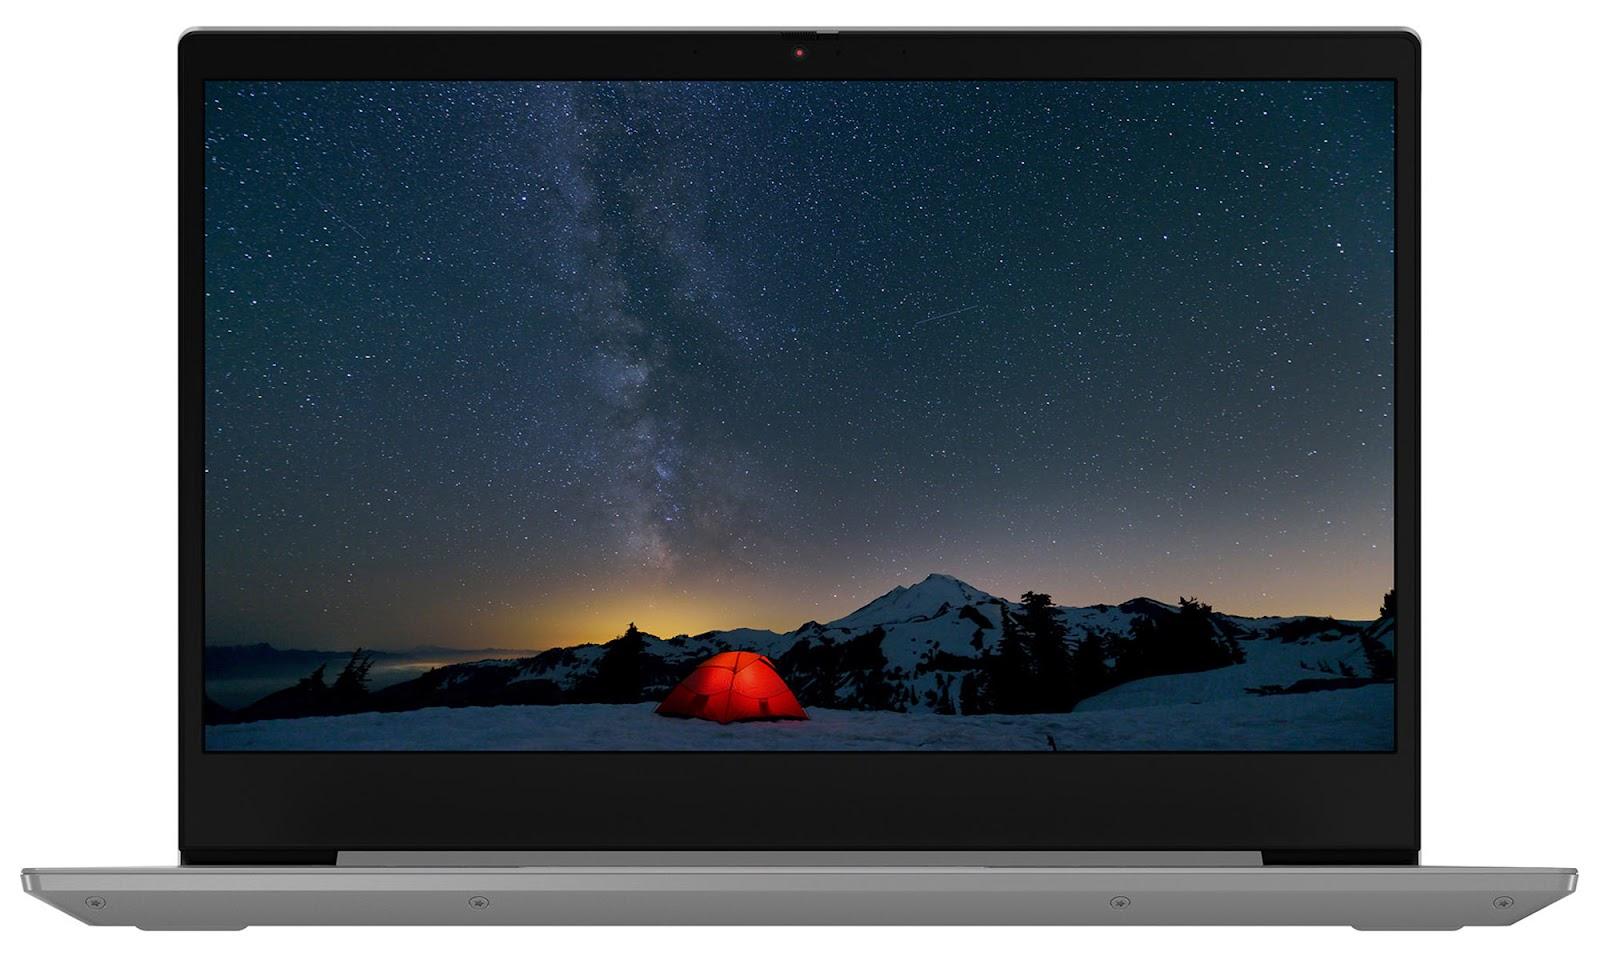 Фото 1. Ноутбук Lenovo ThinkBook 14-IIL (20SL002YRU)